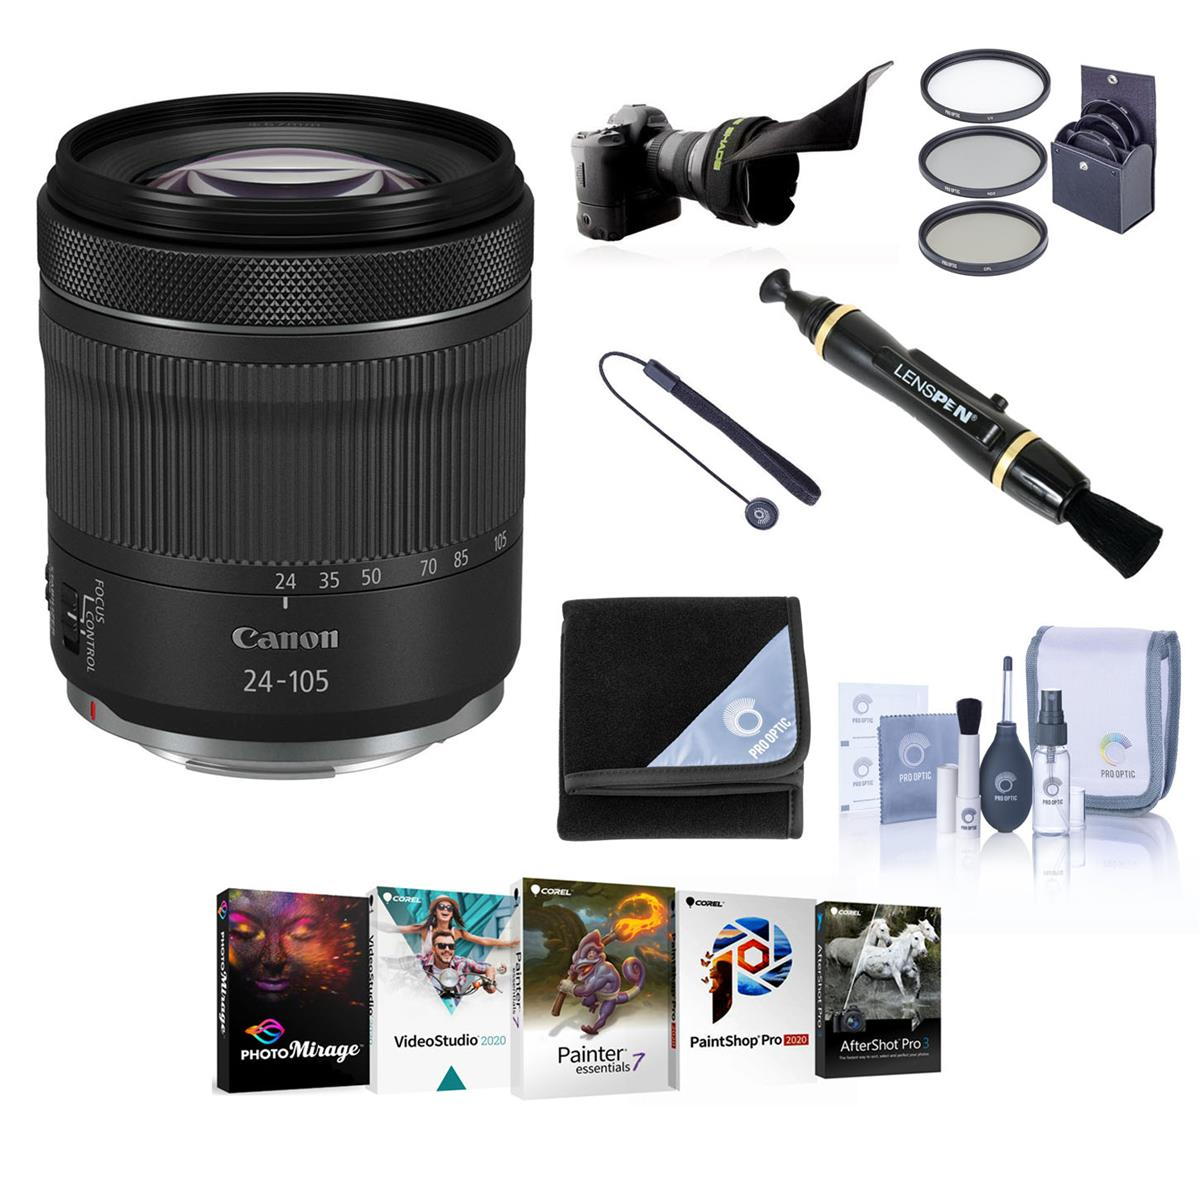 Canon RF 24-105mm f/4-7.1 IS STM Lens - Bundle With 67mm Filter Kit, Flex Lens Shade, LensPen Lens Cleaner, Lens Wrap, Cleaning Kit, Capleash, Software Package